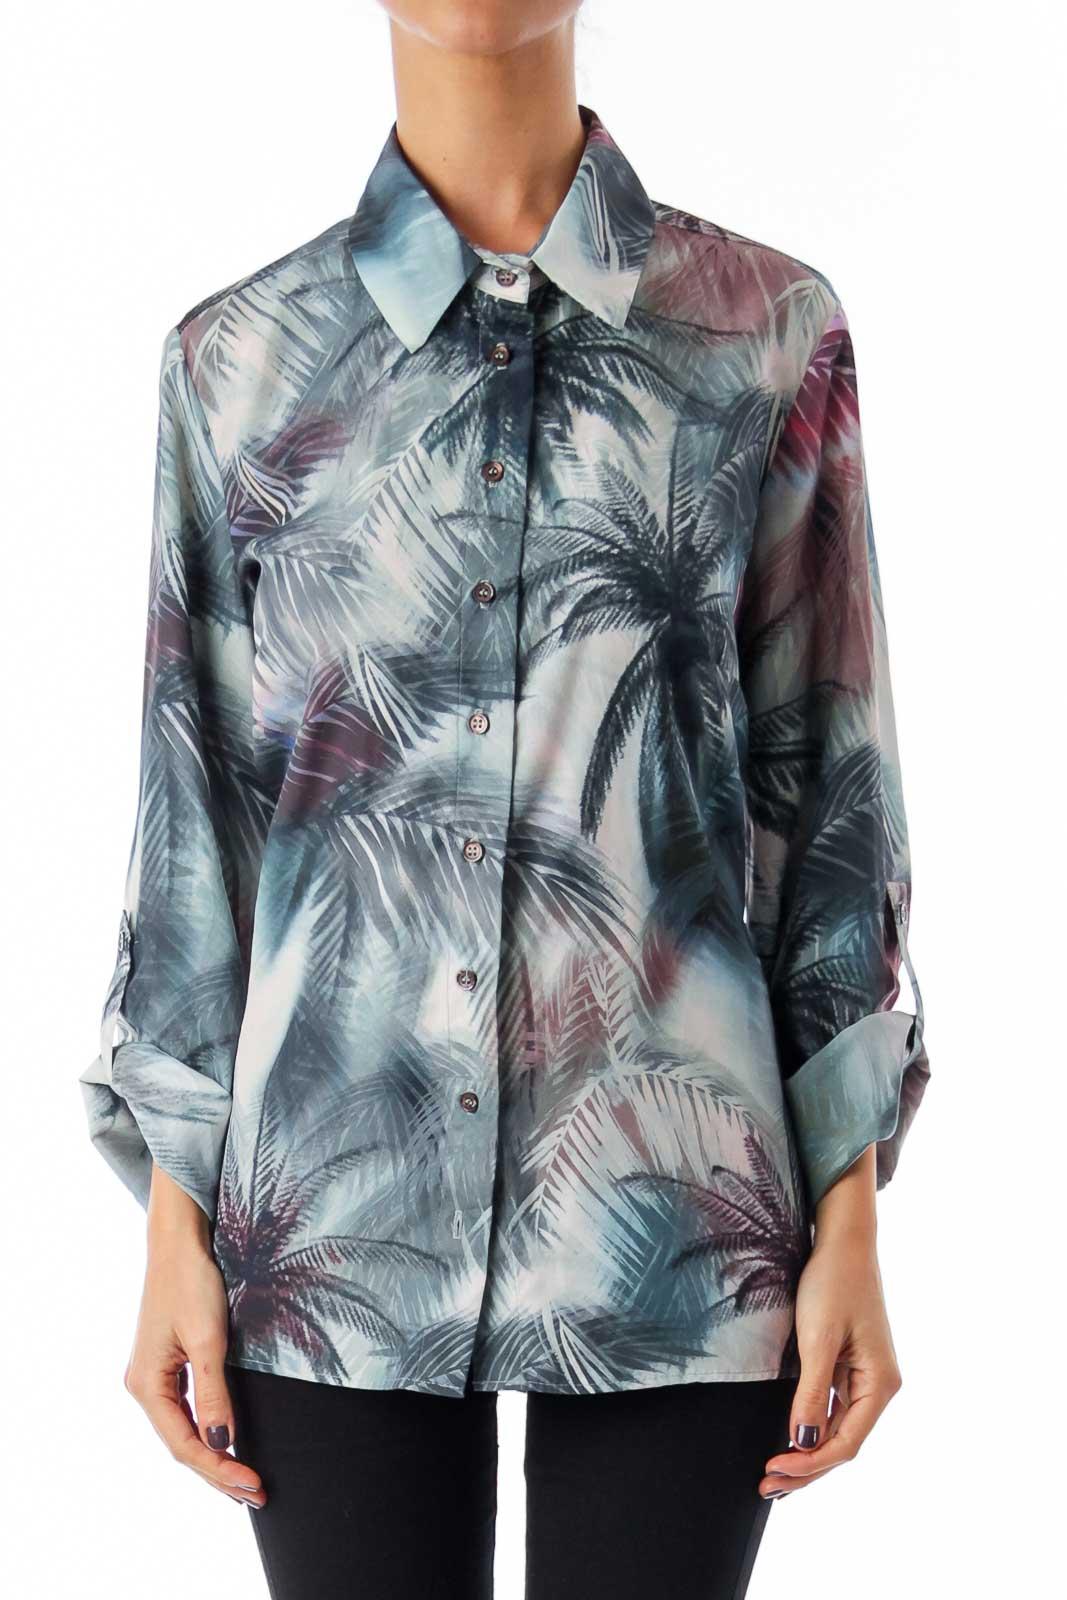 Green Tropical Tree Printed Shirt Front